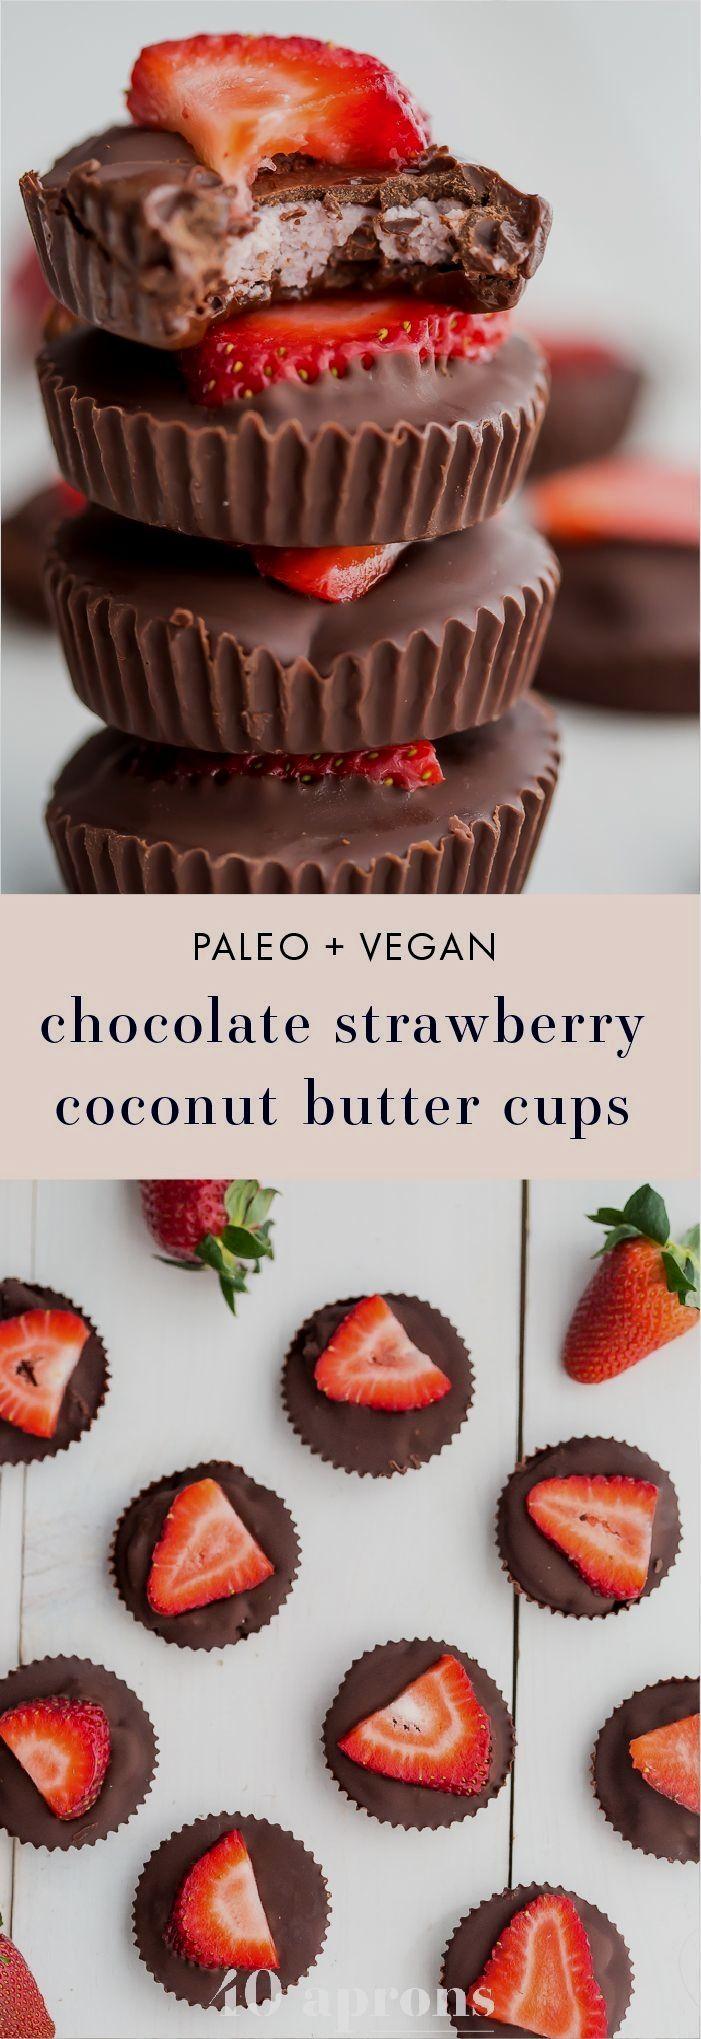 Pin by james wuestman on Recipes Paleo chocolate, Paleo